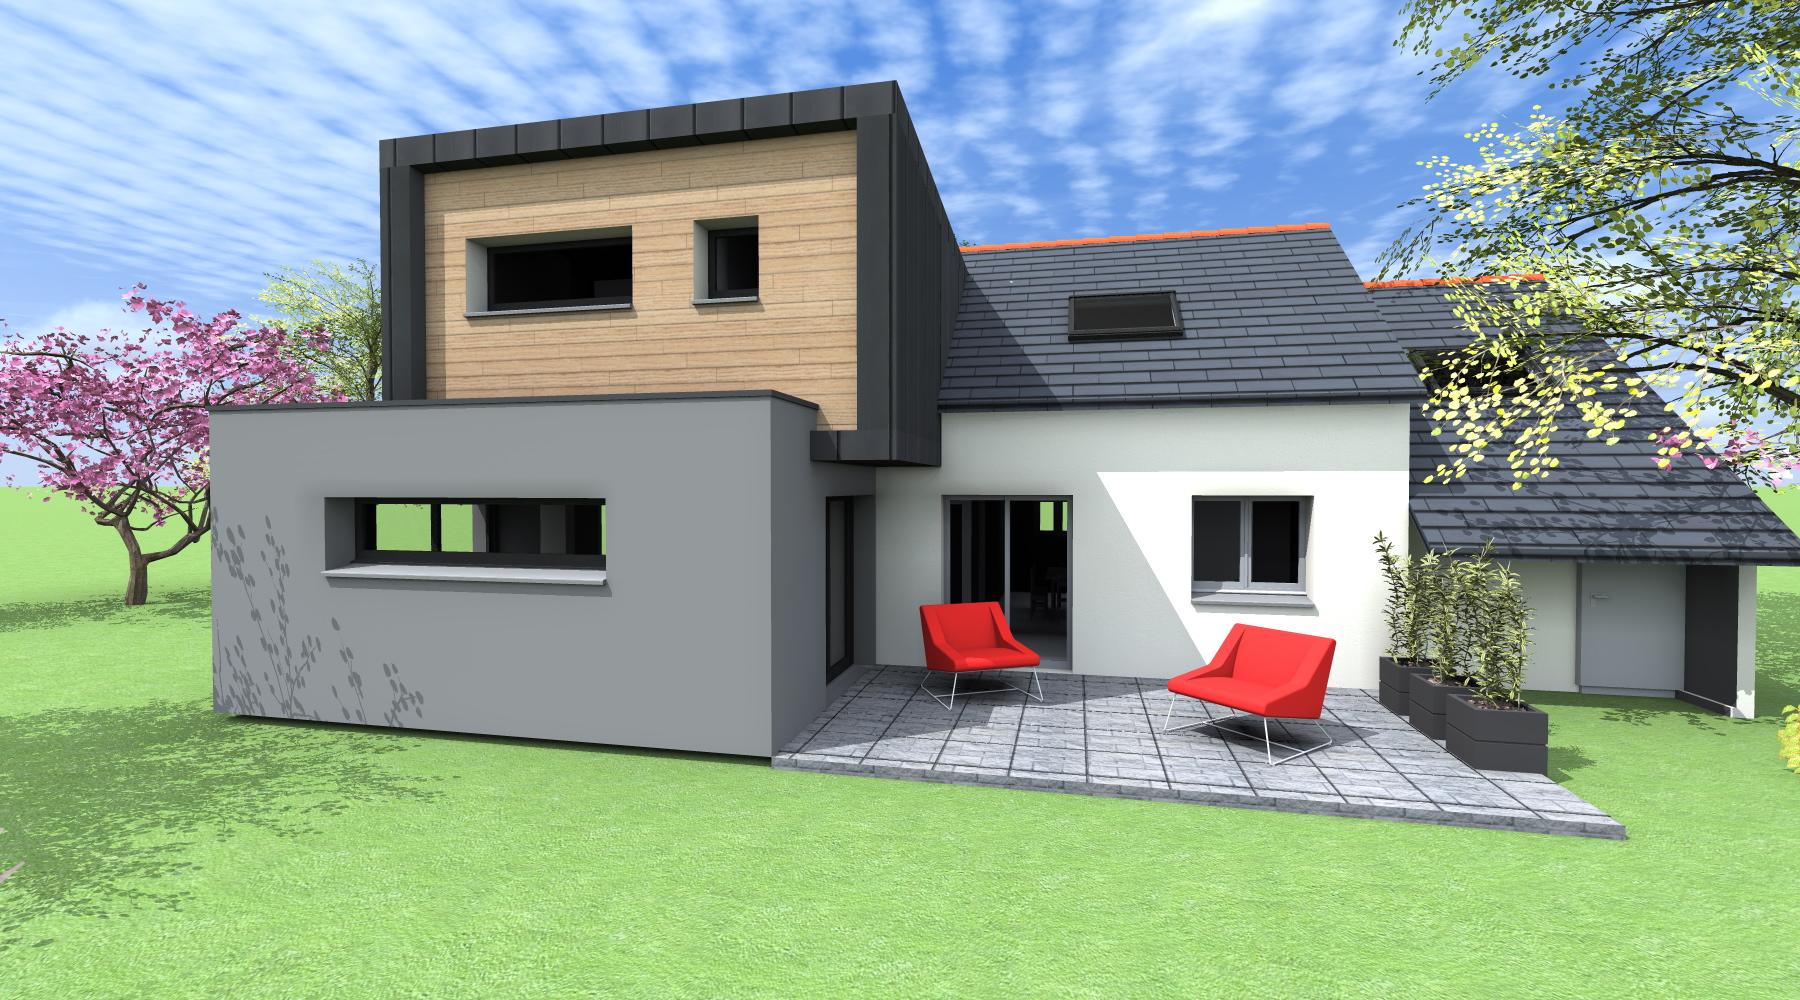 Fa ade maison moderne mc immo - Couleur facade maison contemporaine ...